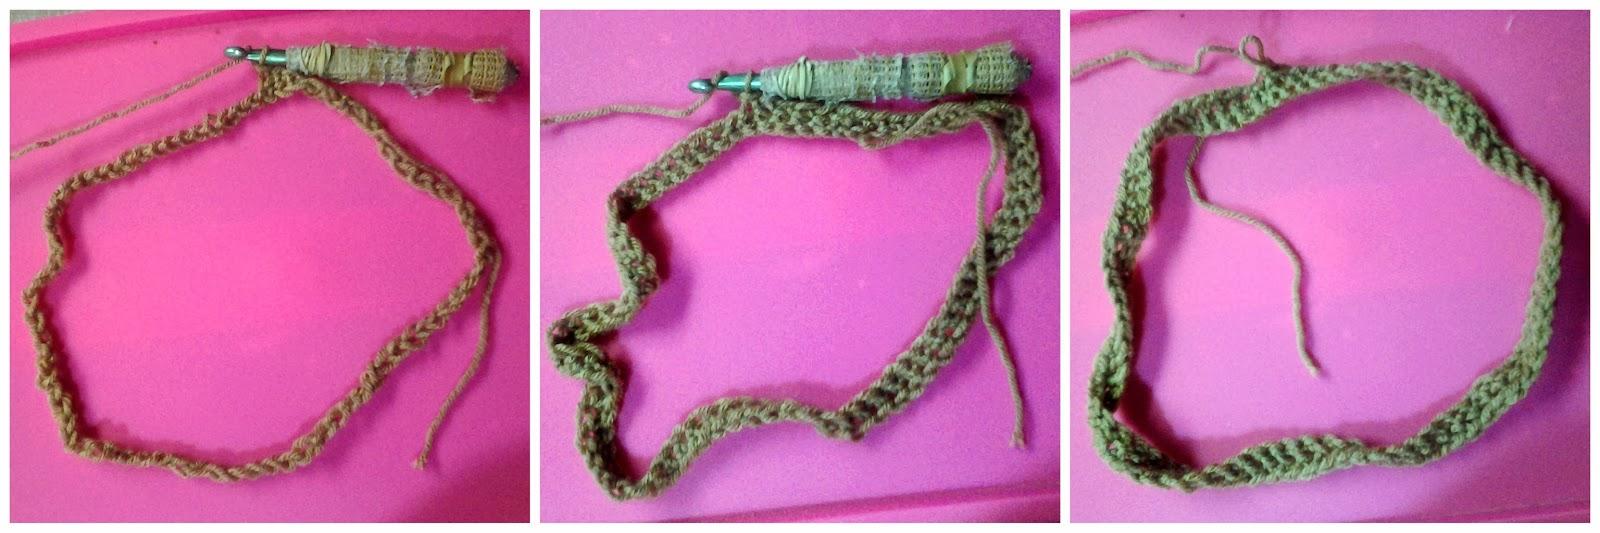 The crochet chain takes shape